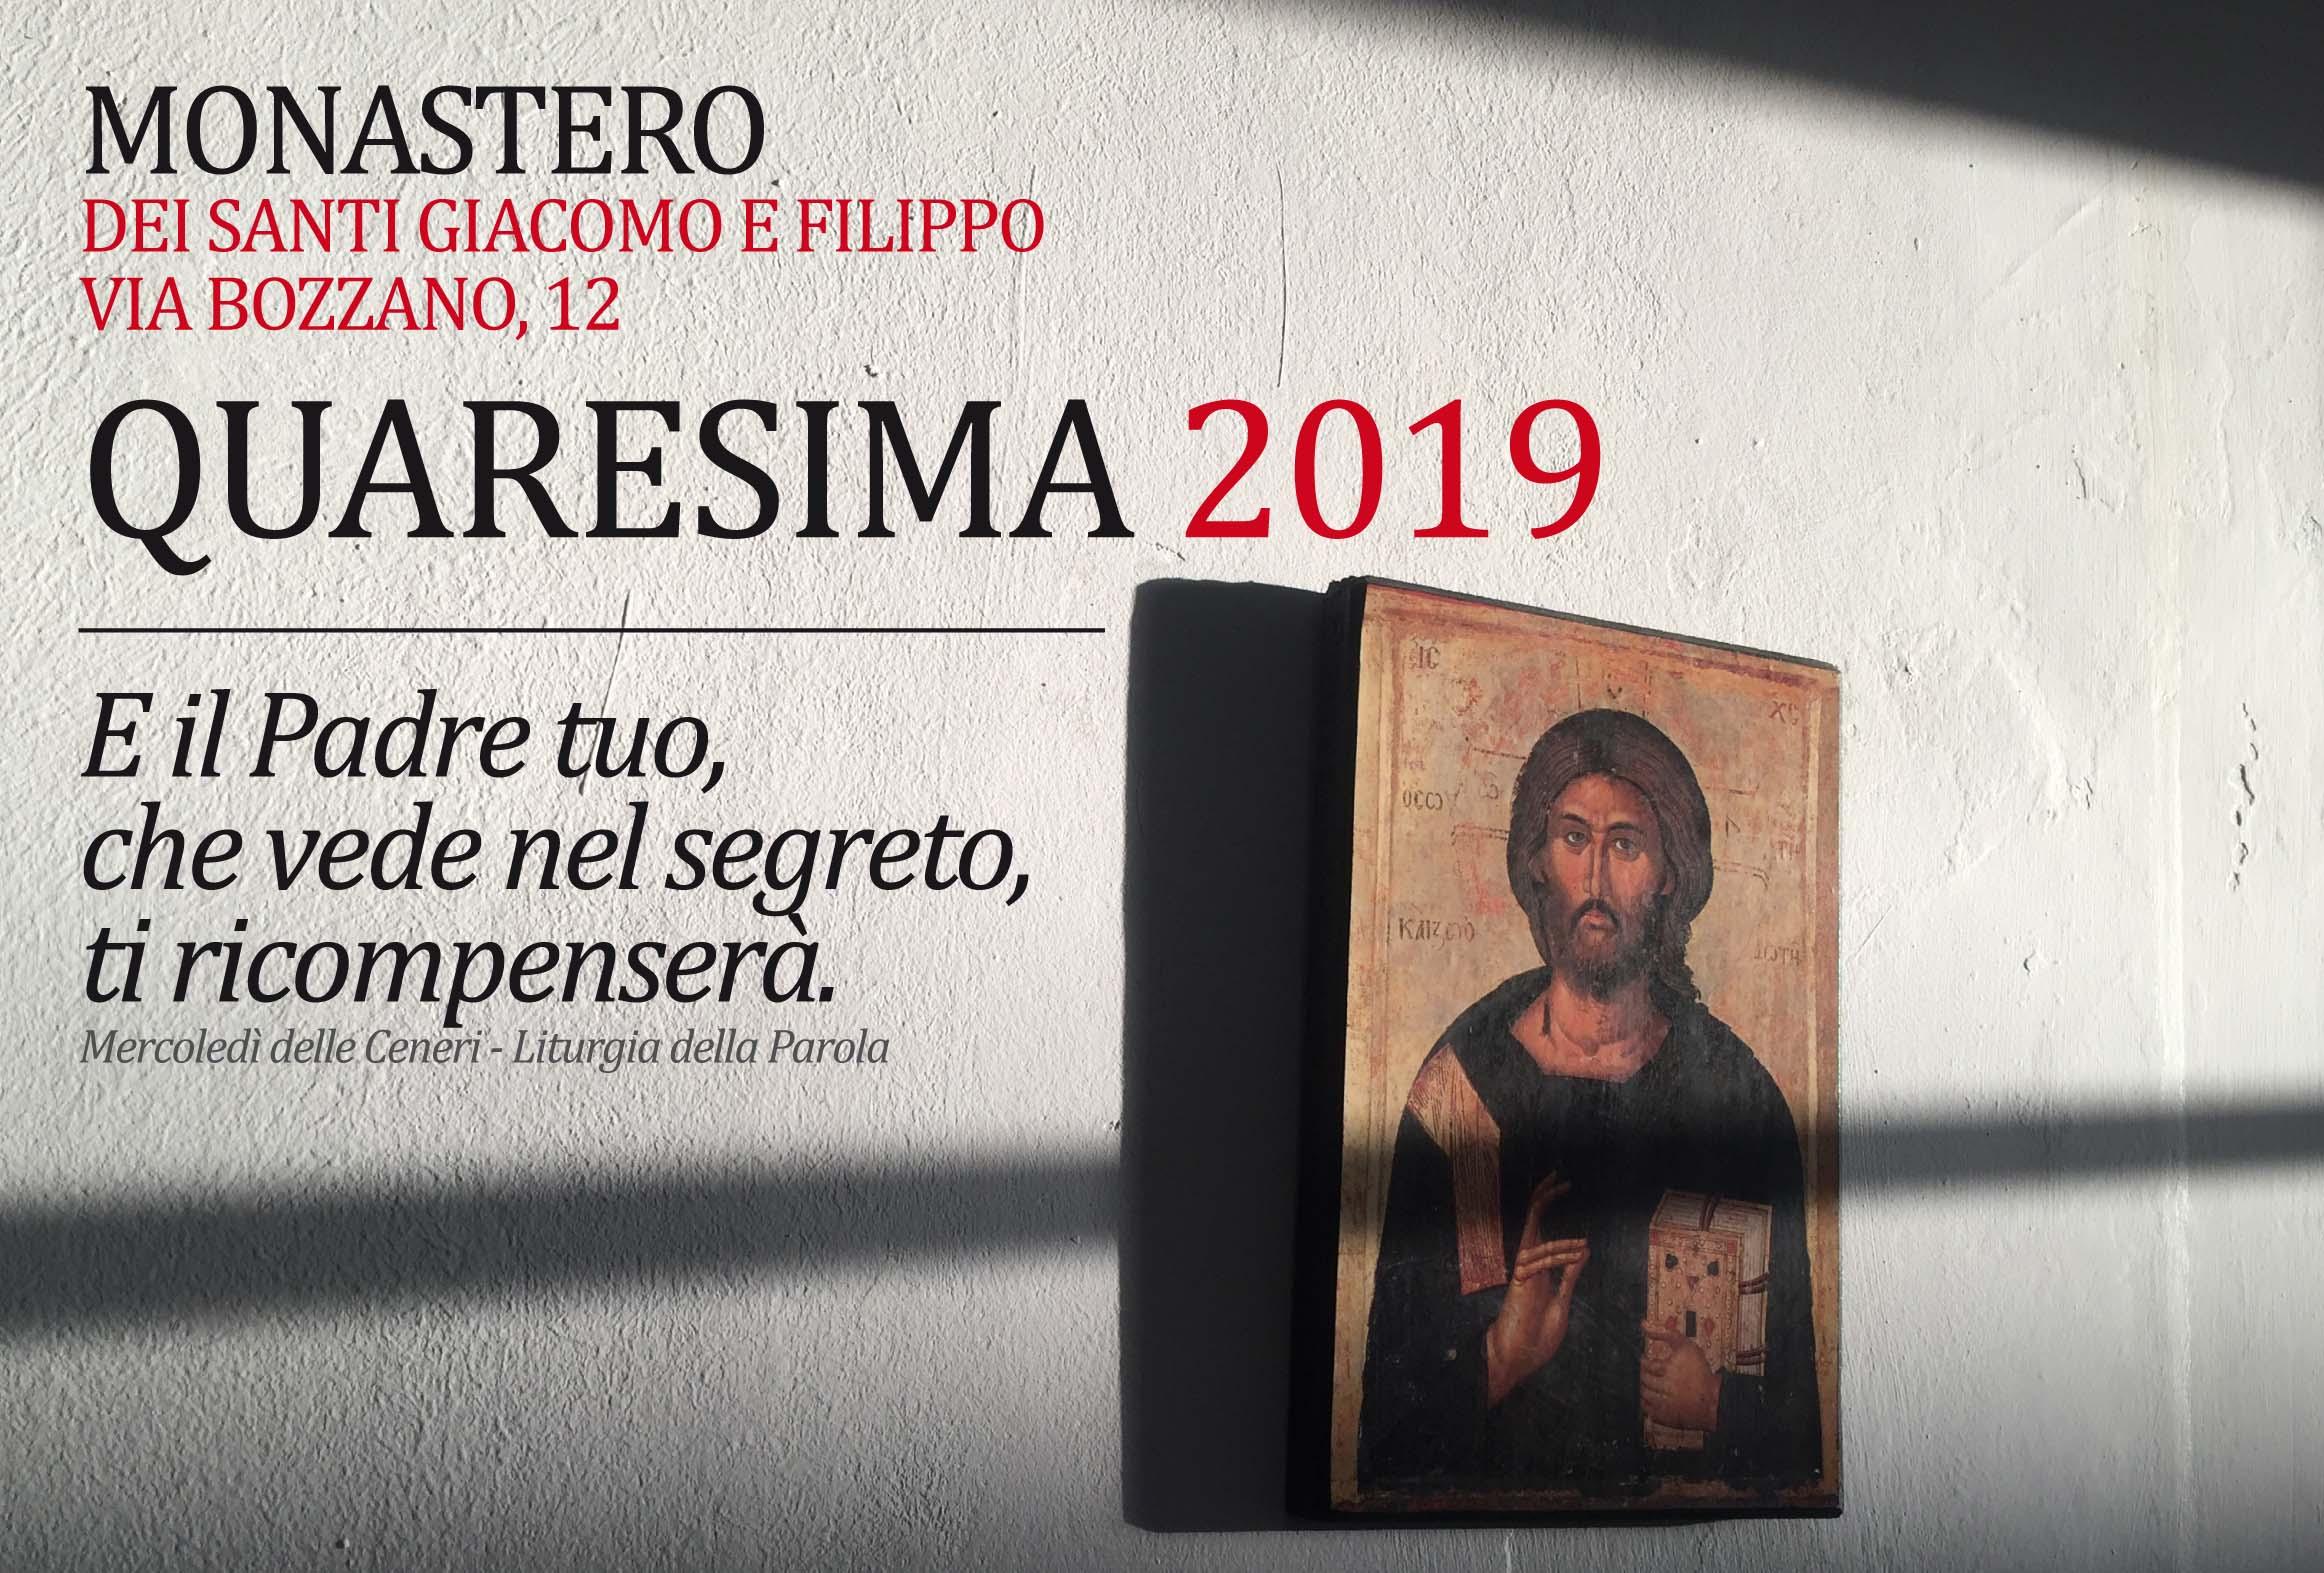 6 Marzo: Mercoledì delle Ceneri al Monastero